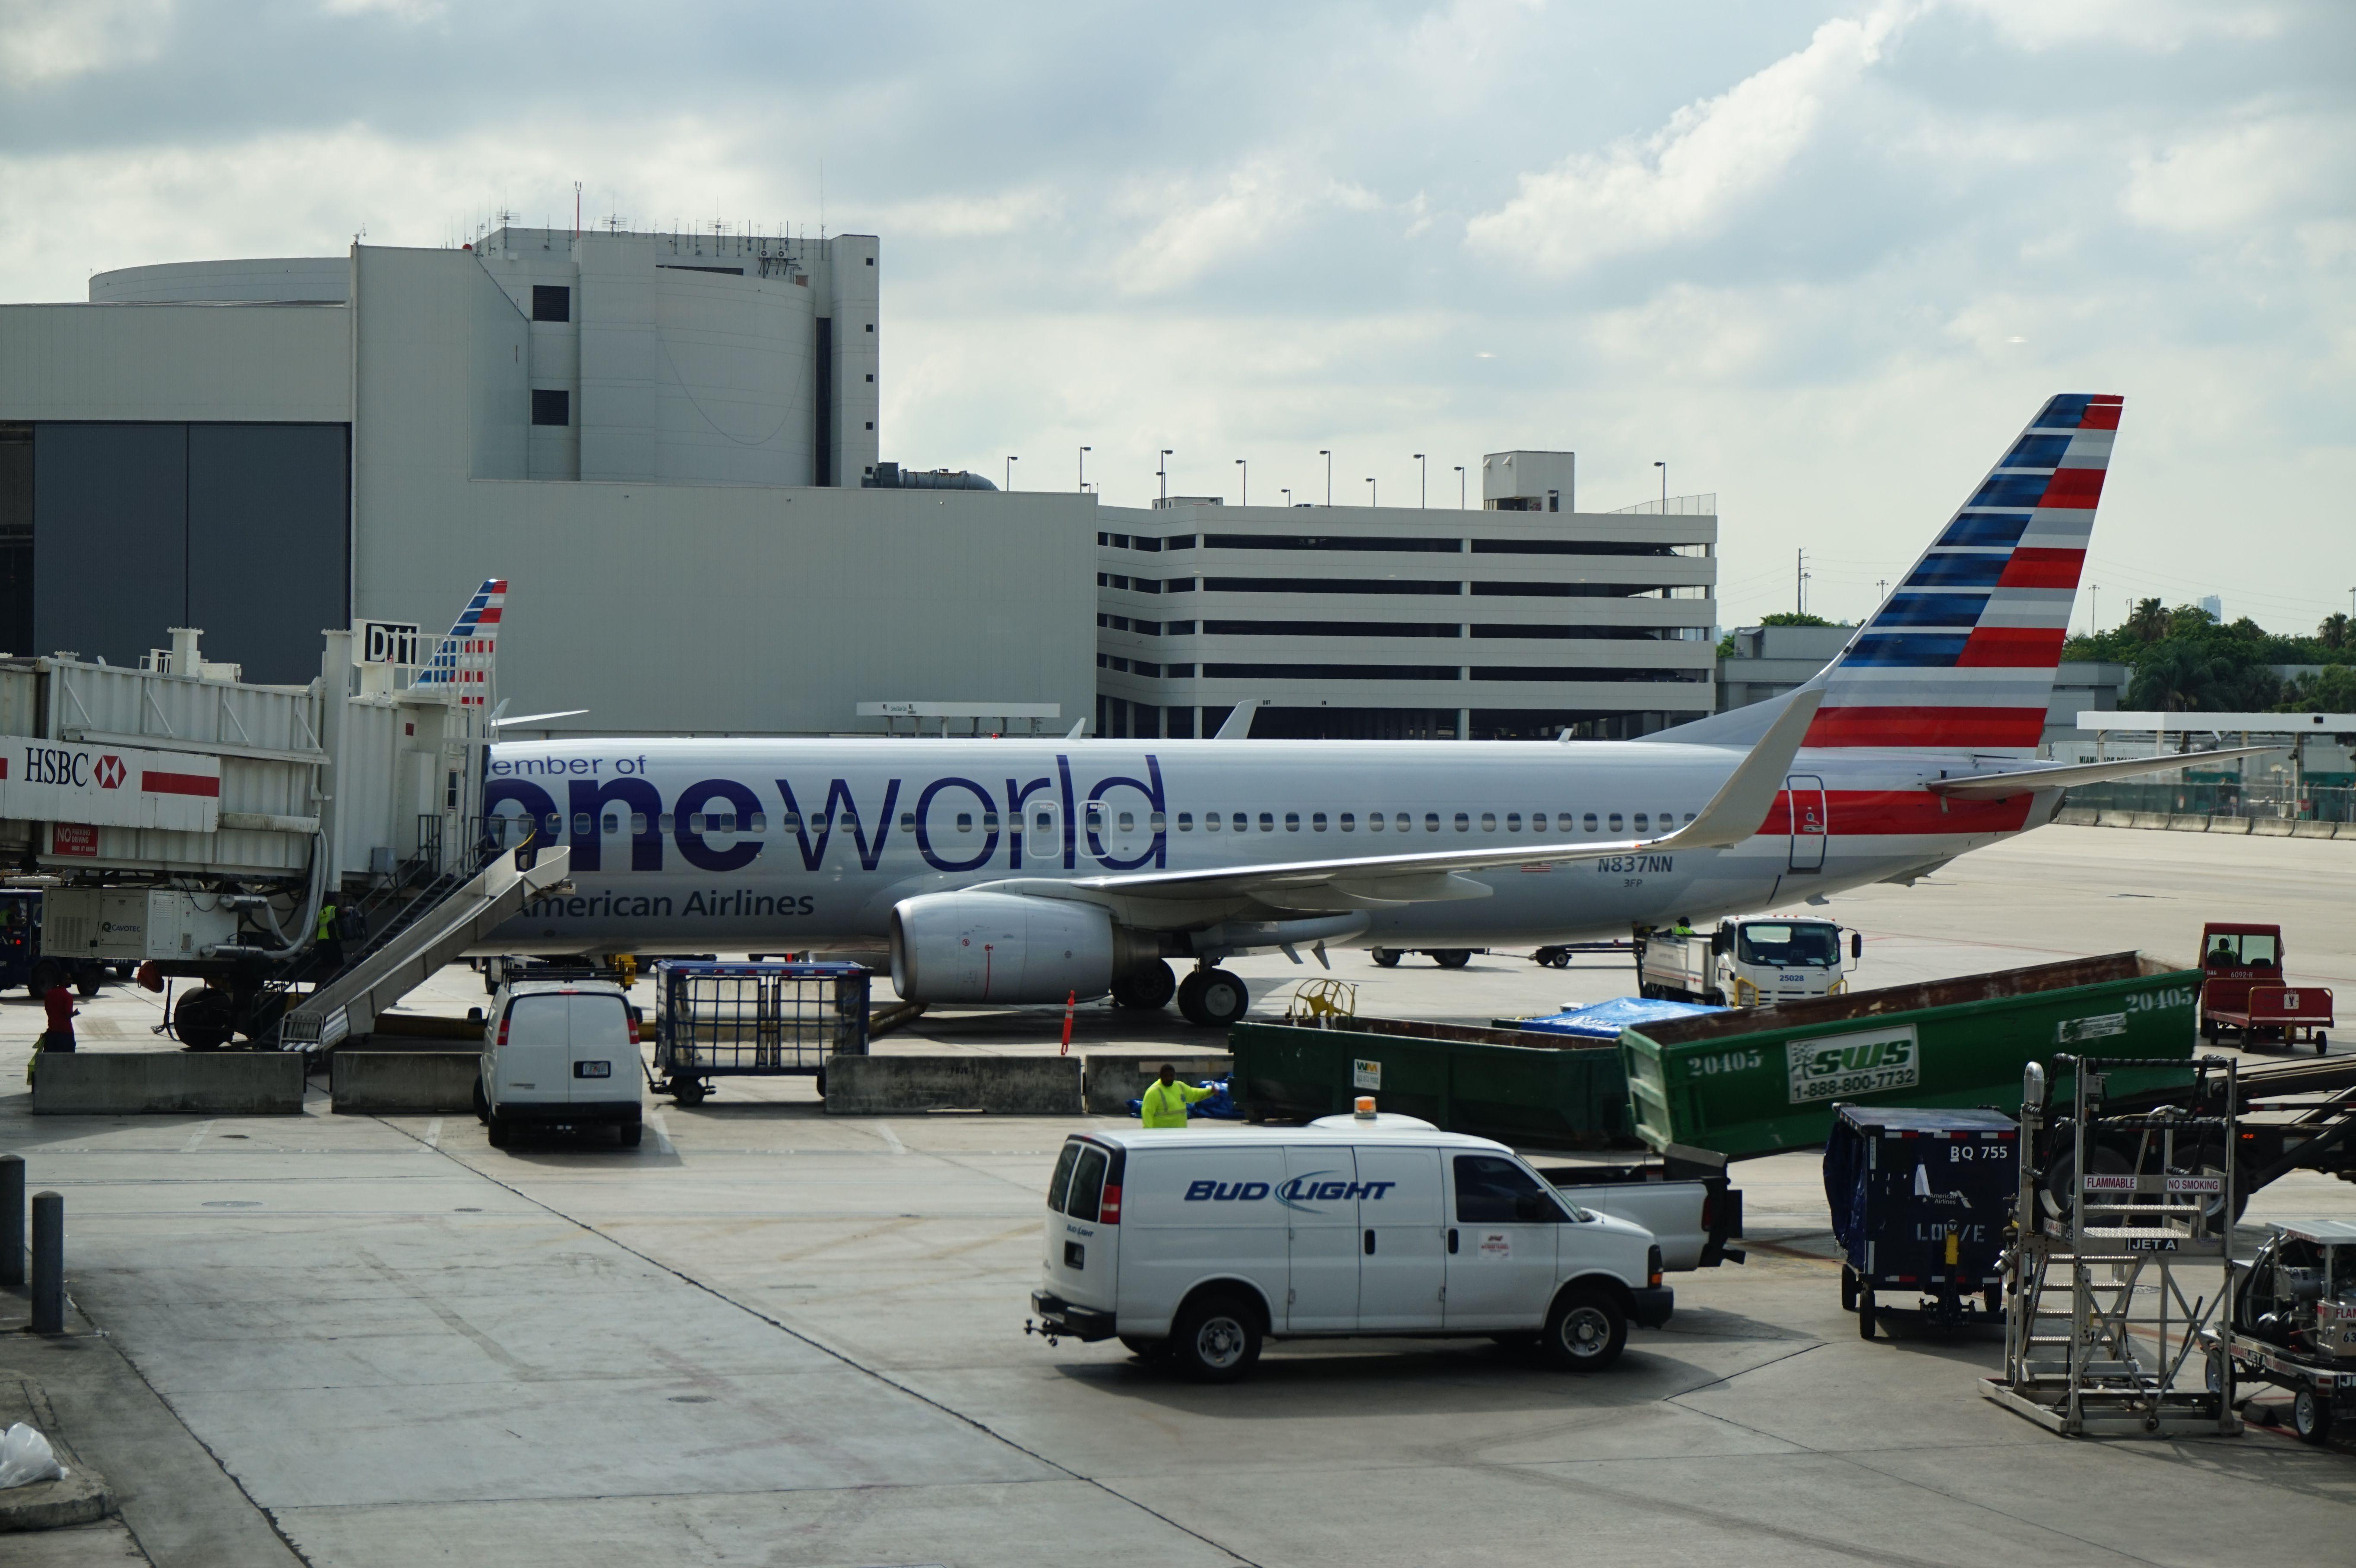 American Airlines at Miami International Airport Aeroporto